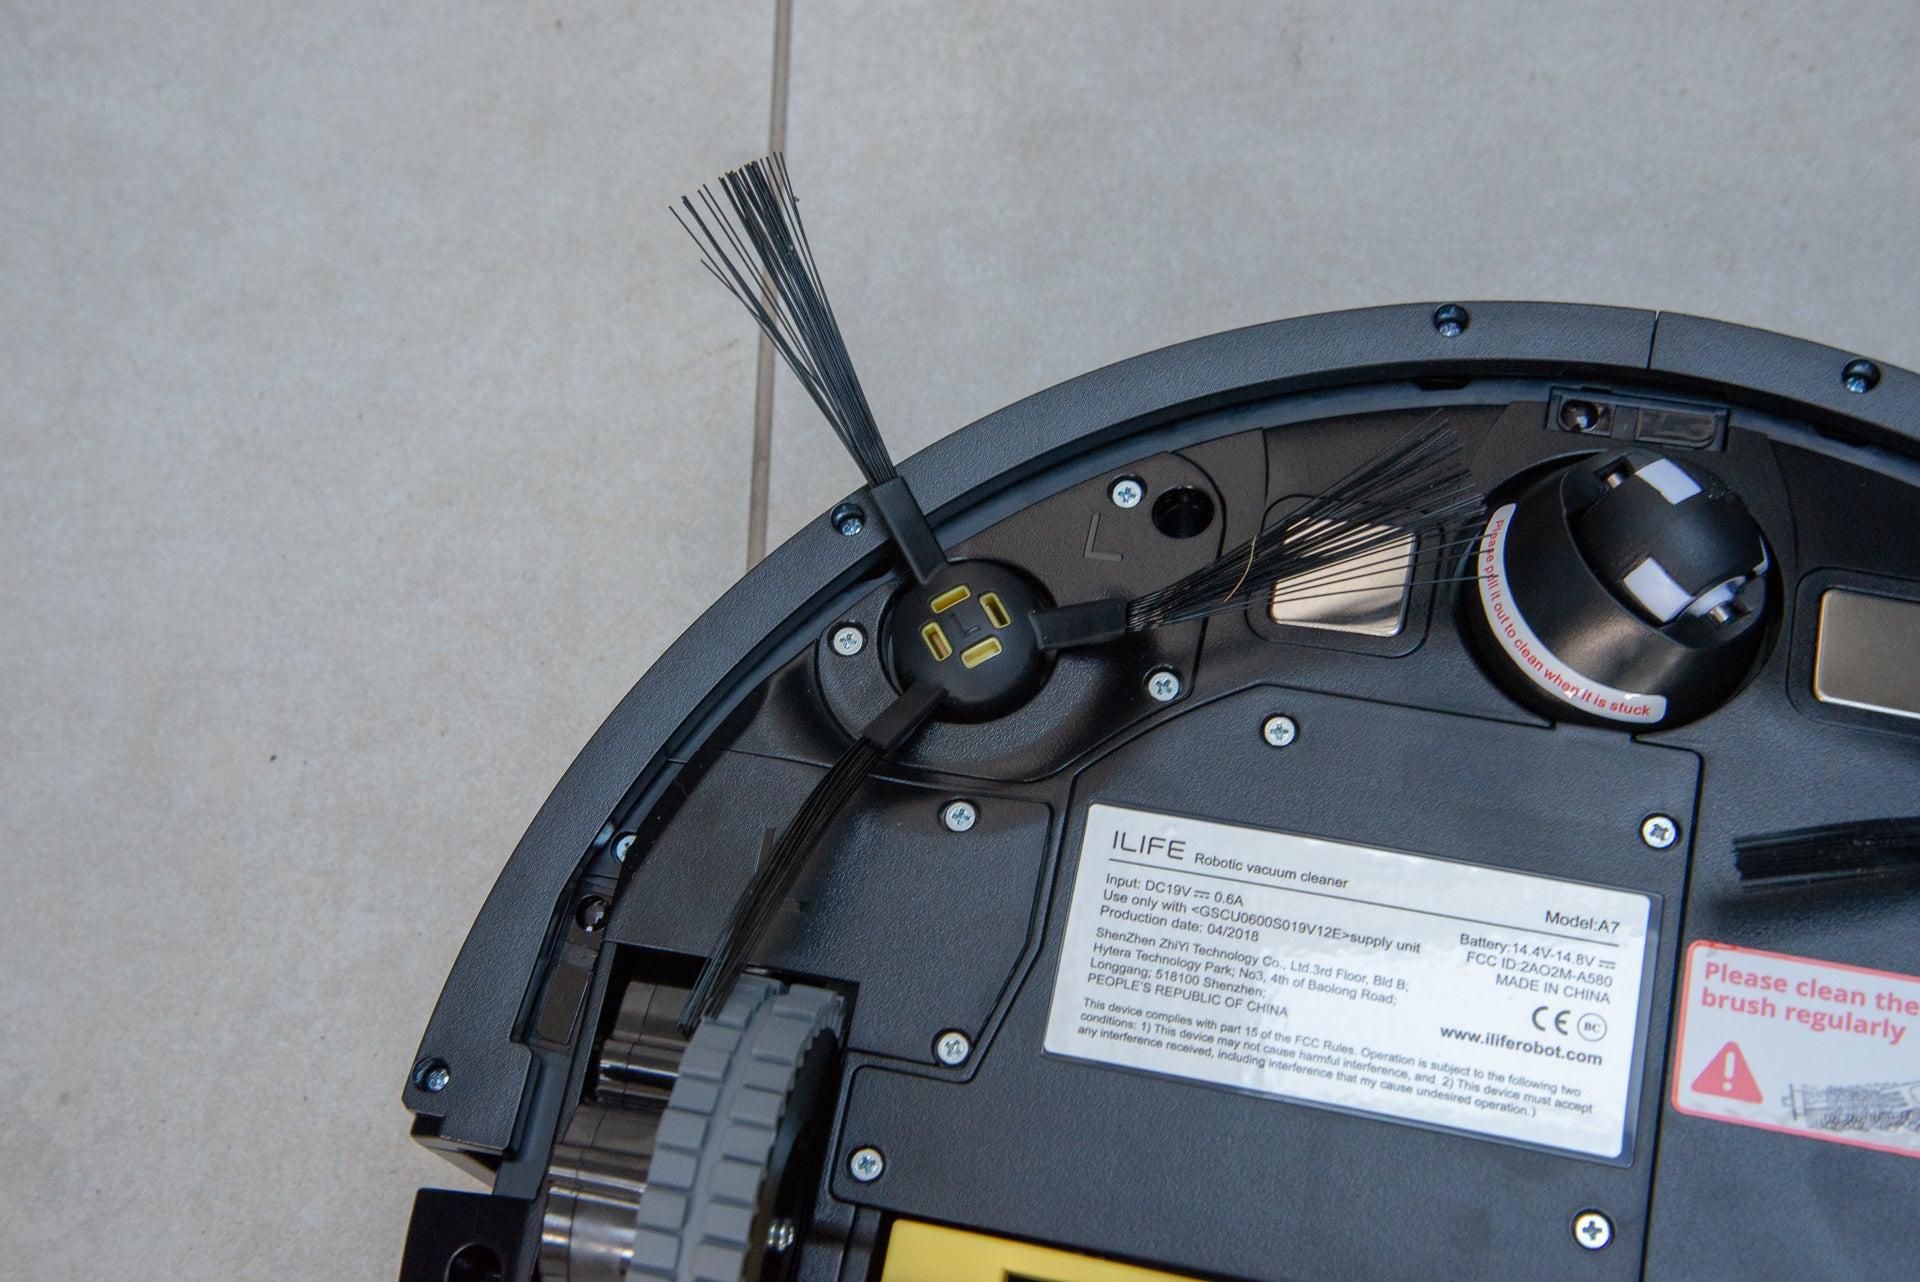 iLife A7 Robotic Vacuum Cleaner side brush